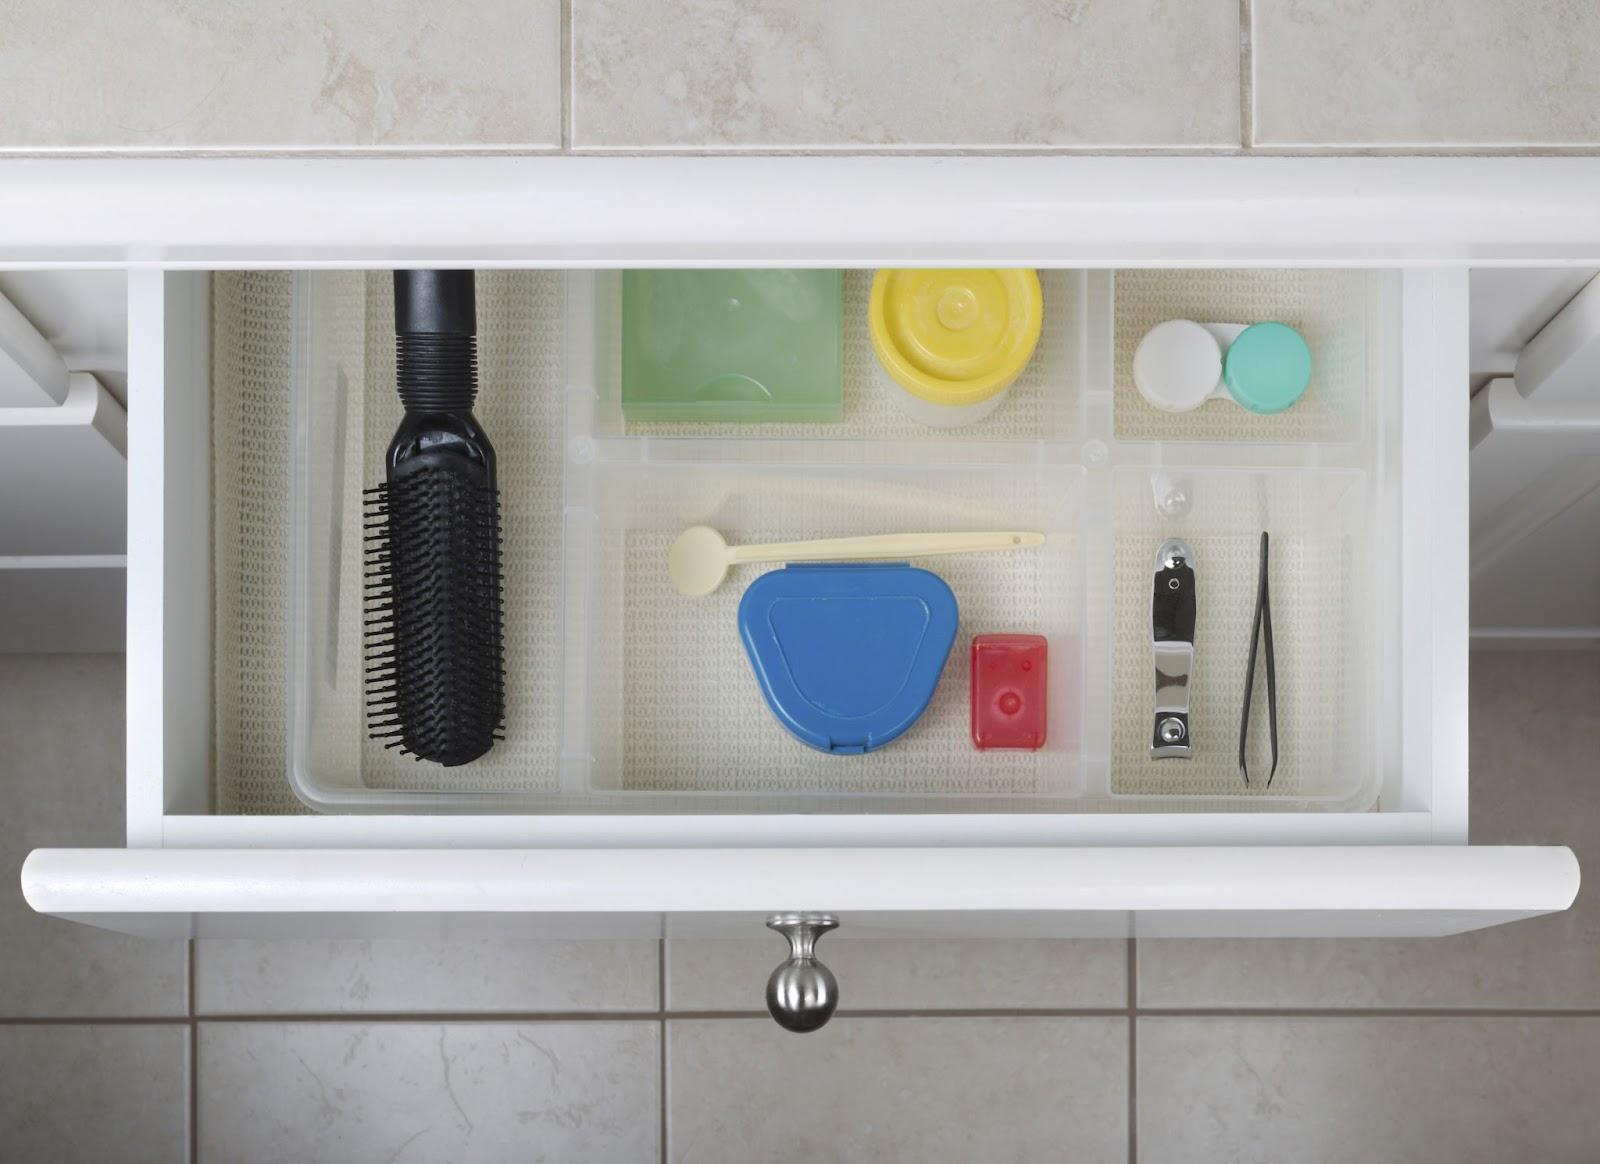 4GRKou21MS zX NUskGYfc6vqnTqHIomfo4cSSbpHJ Ko5yBLmL0qml9ttyP0ZJf8E7YtekV2ljwAzrpz4Q6CrYp5QIGlo Pc8 uSUYT 89lYB3eA JCrPM9HSJK2a 4wf34YBAk - Bathroom Organization Remodel in 5 Steps